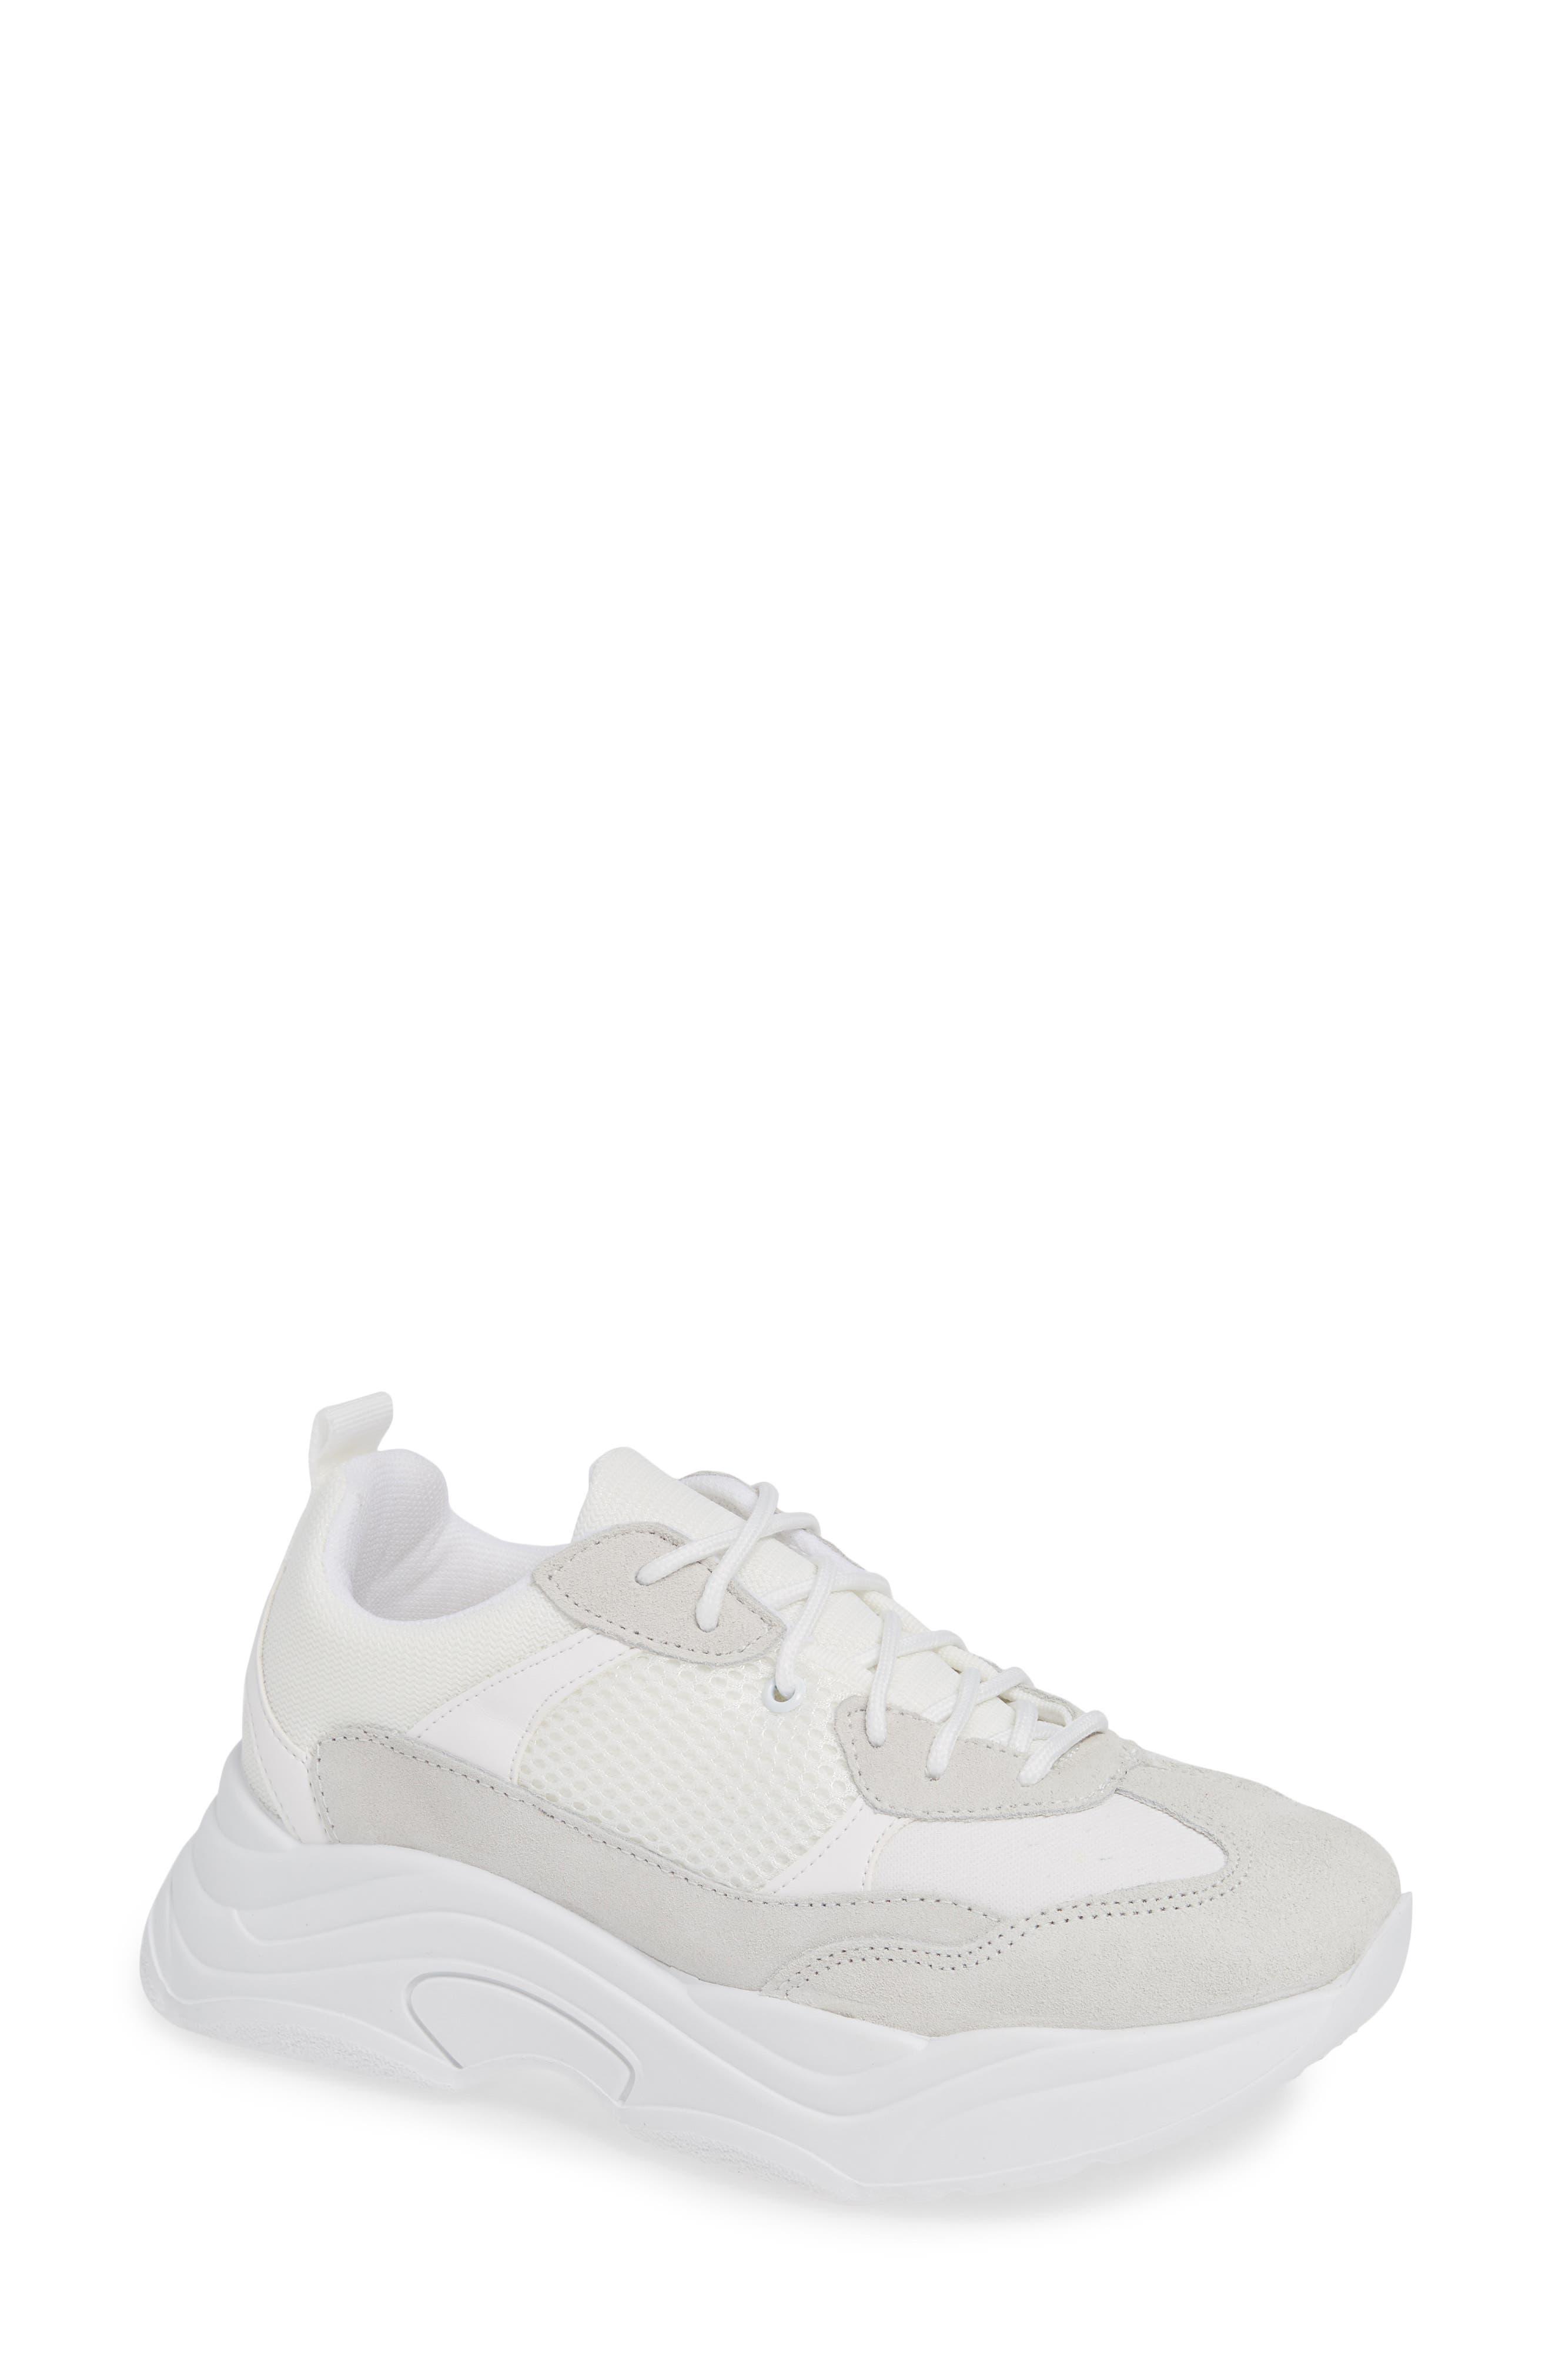 Ciara Chunky Sneaker,                             Main thumbnail 1, color,                             WHITE MULTI